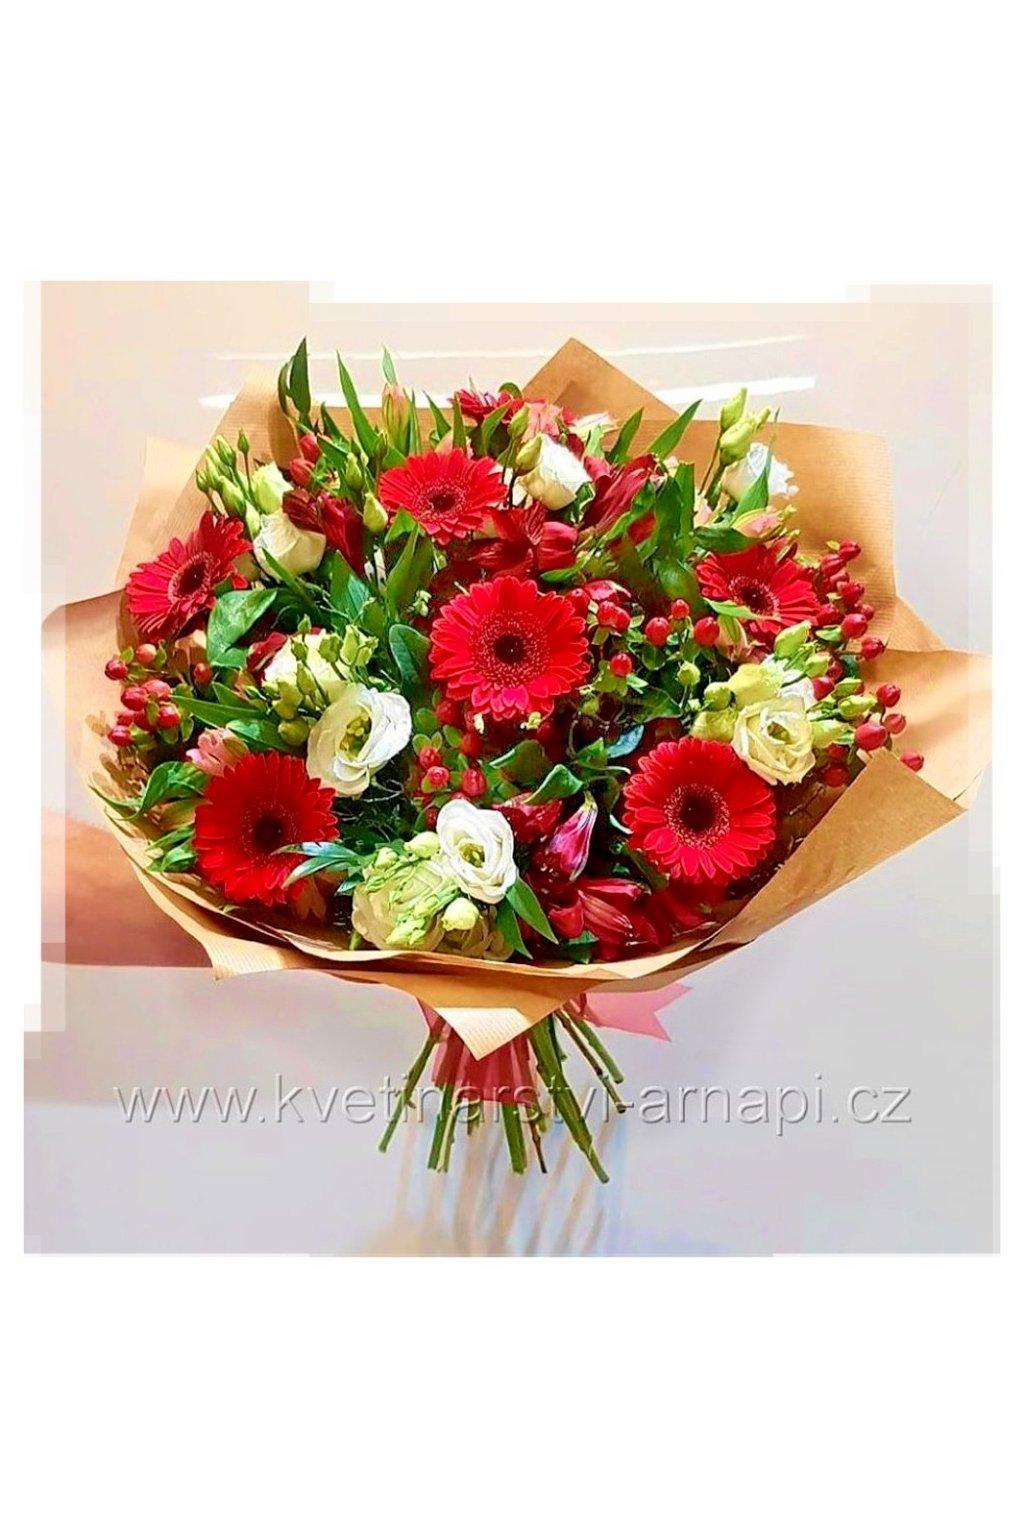 darkova kytice gerbery eustoma kvetinarstvi arnapi